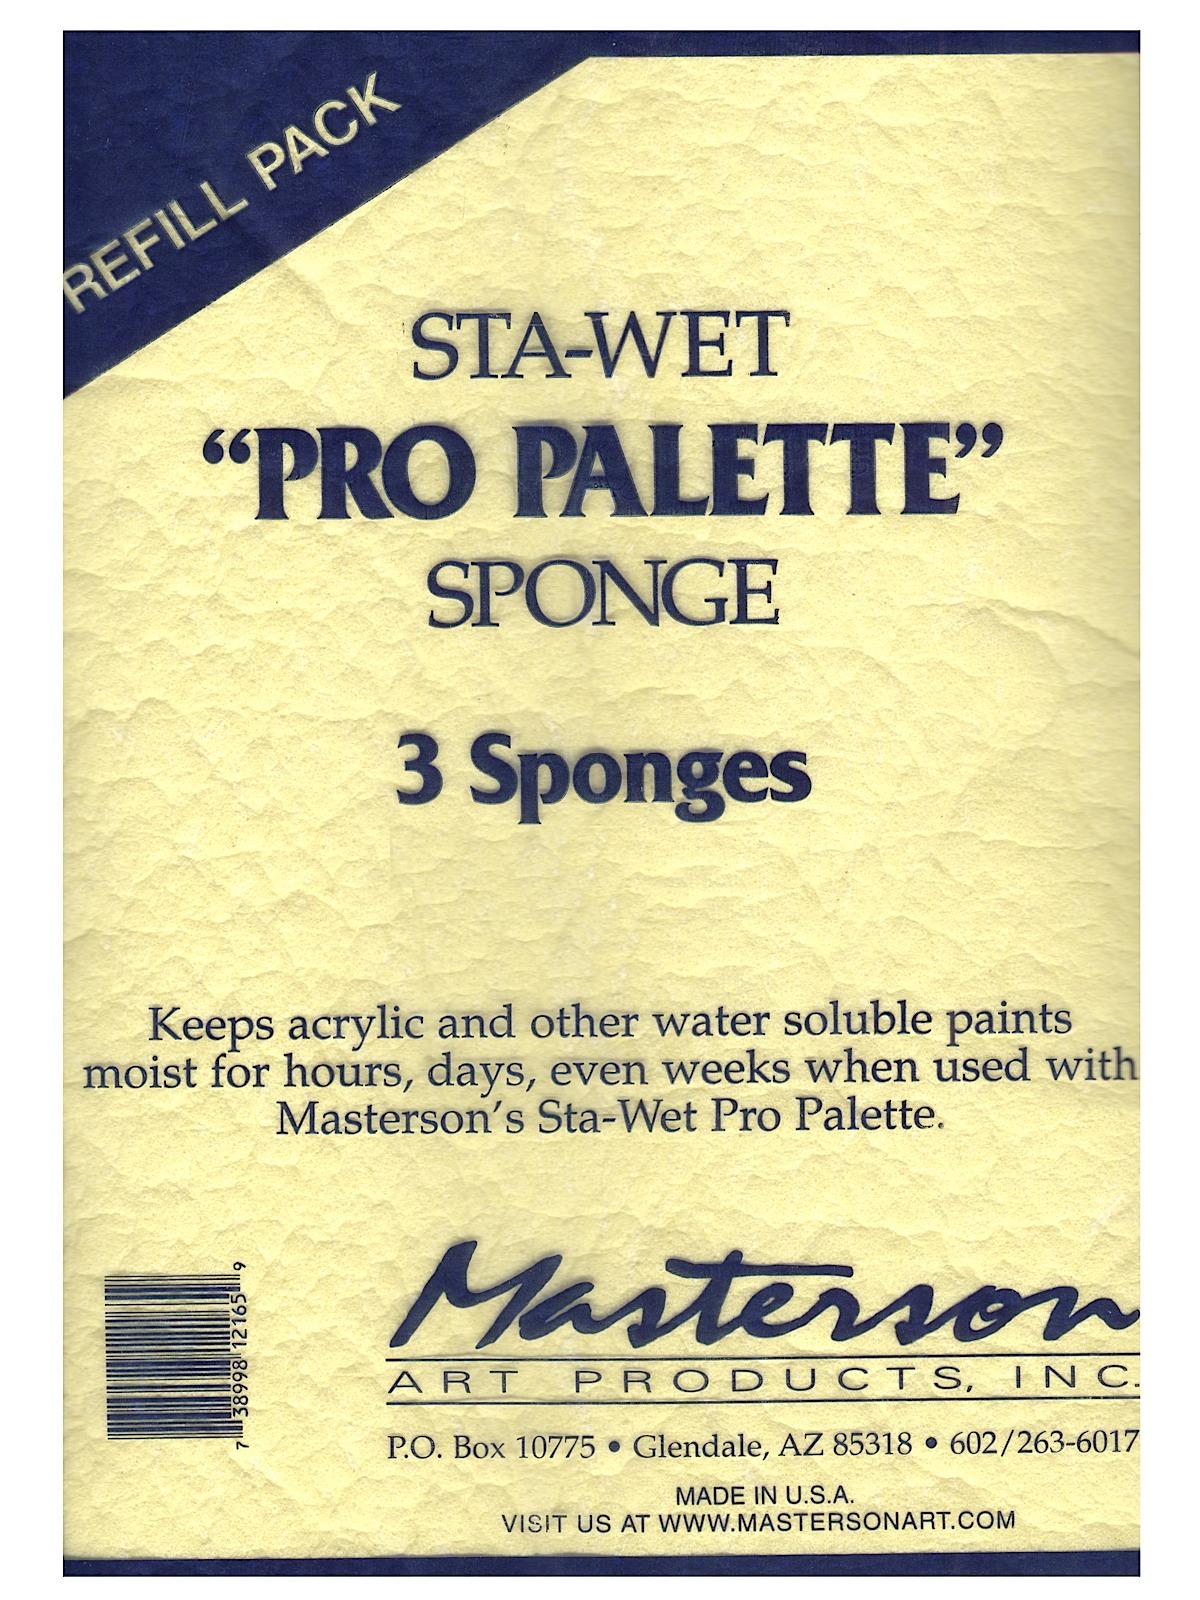 Premier Acrylic Paper and Sponge Refills